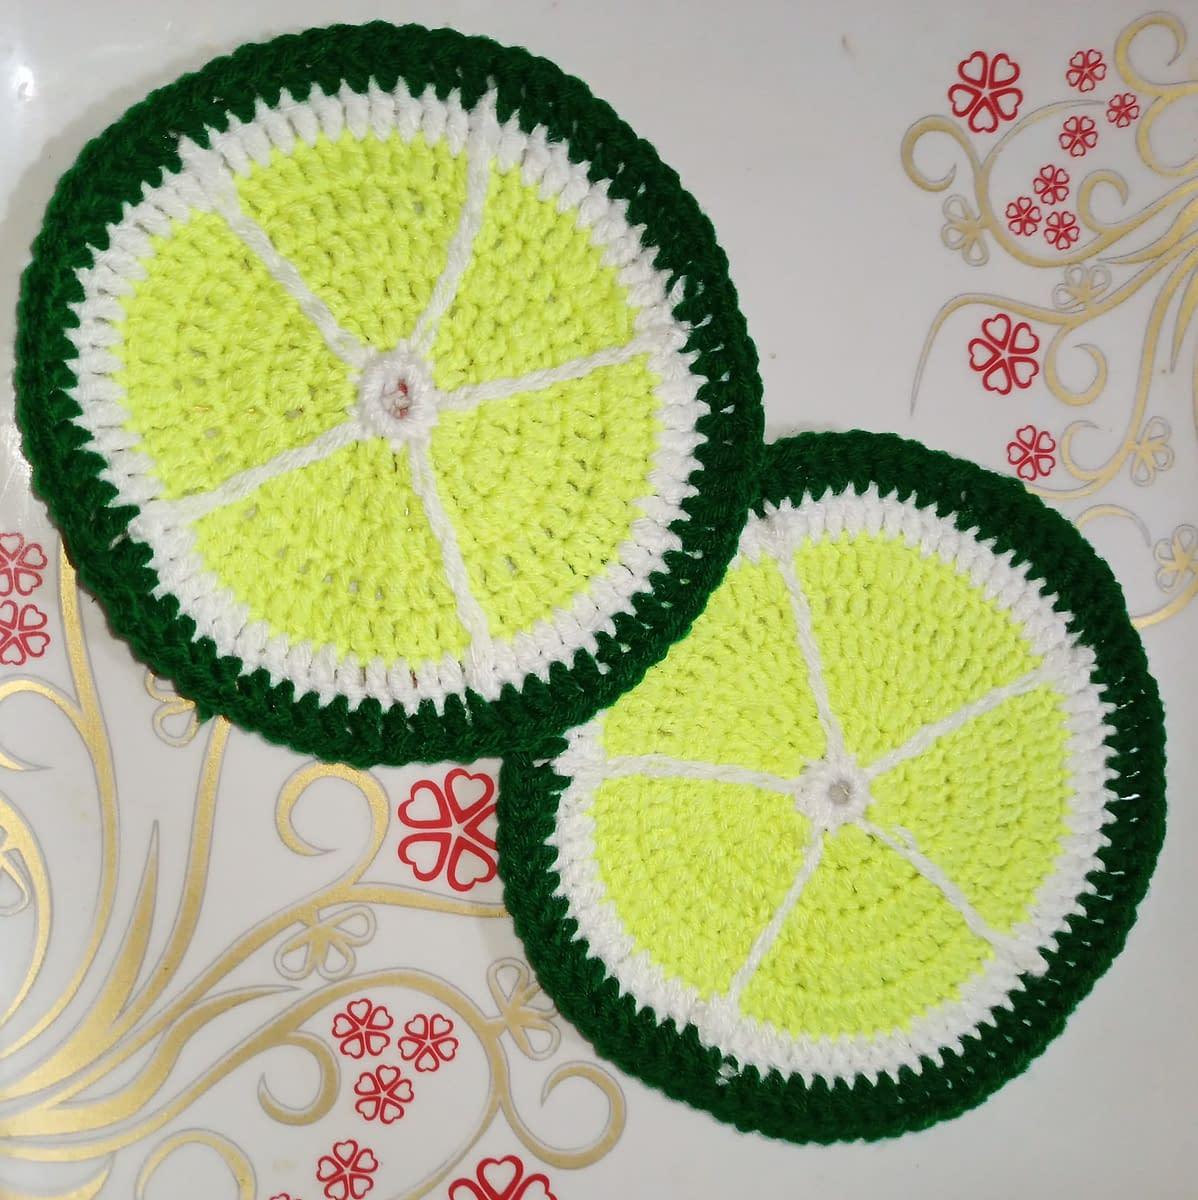 Handmade Crochet coasters 4